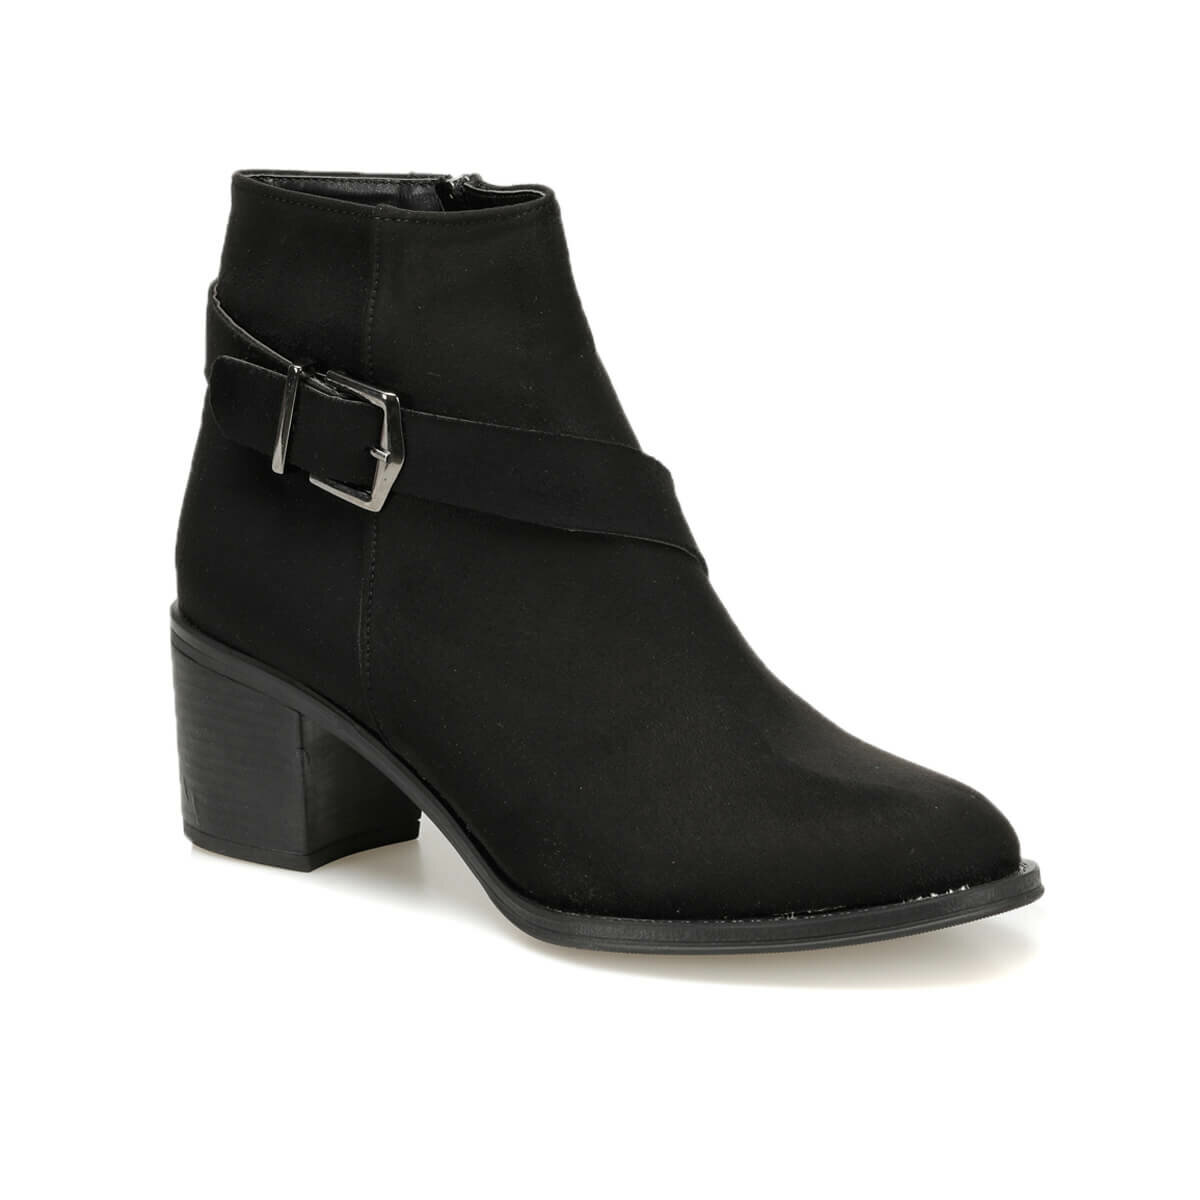 FLO GAITAN85Z SUEDE Black Women Boots BUTIGO